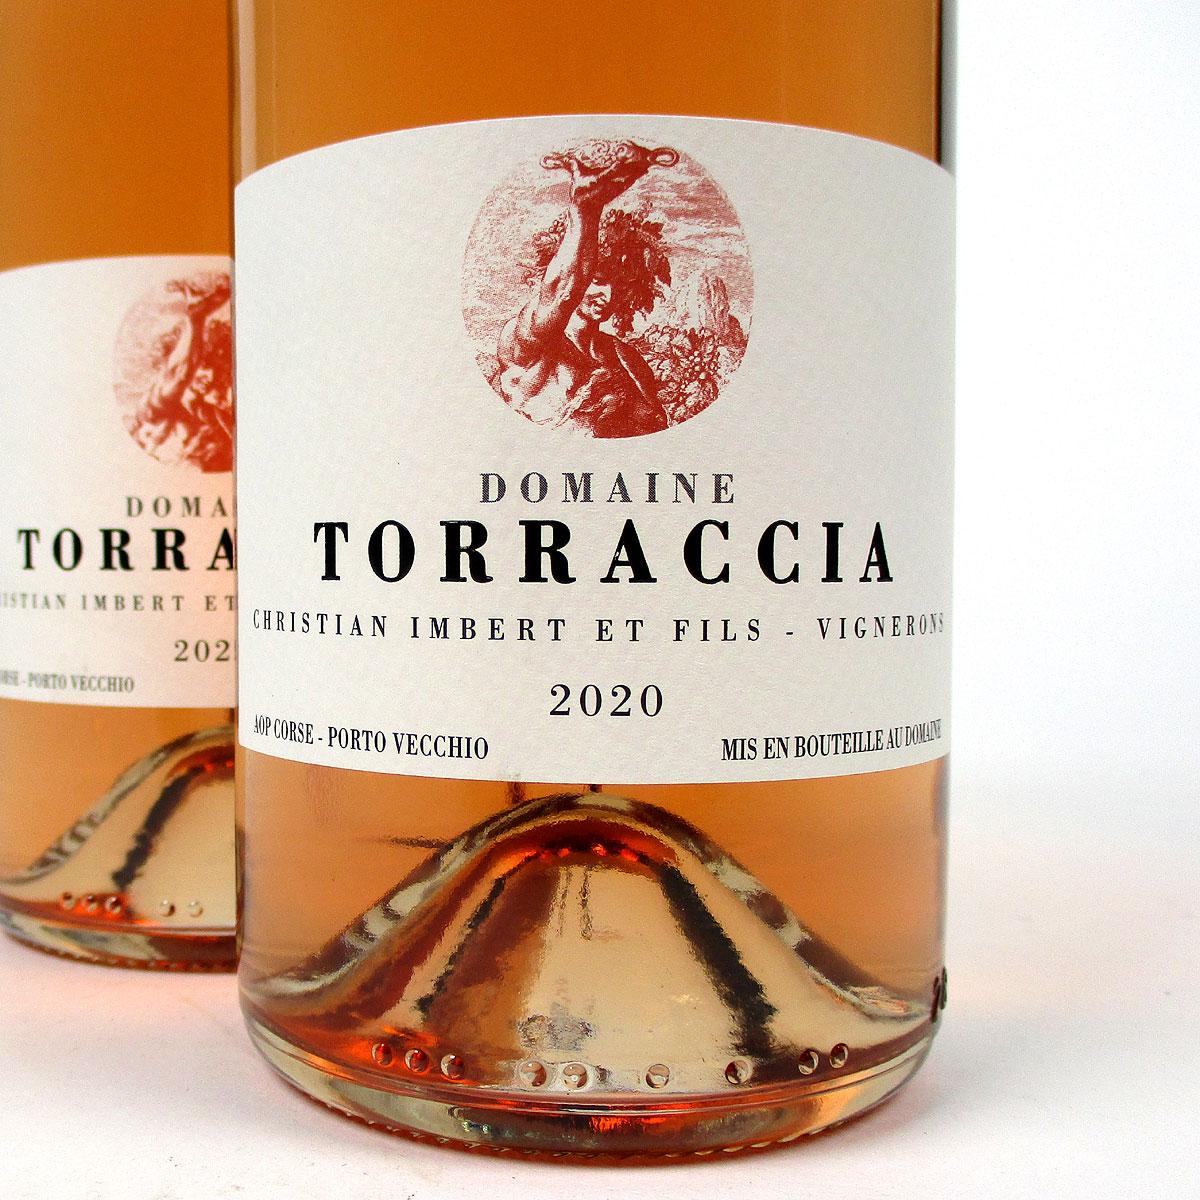 Vin de Corse Porto Vecchio: Domaine de Torraccia Rosé 2020